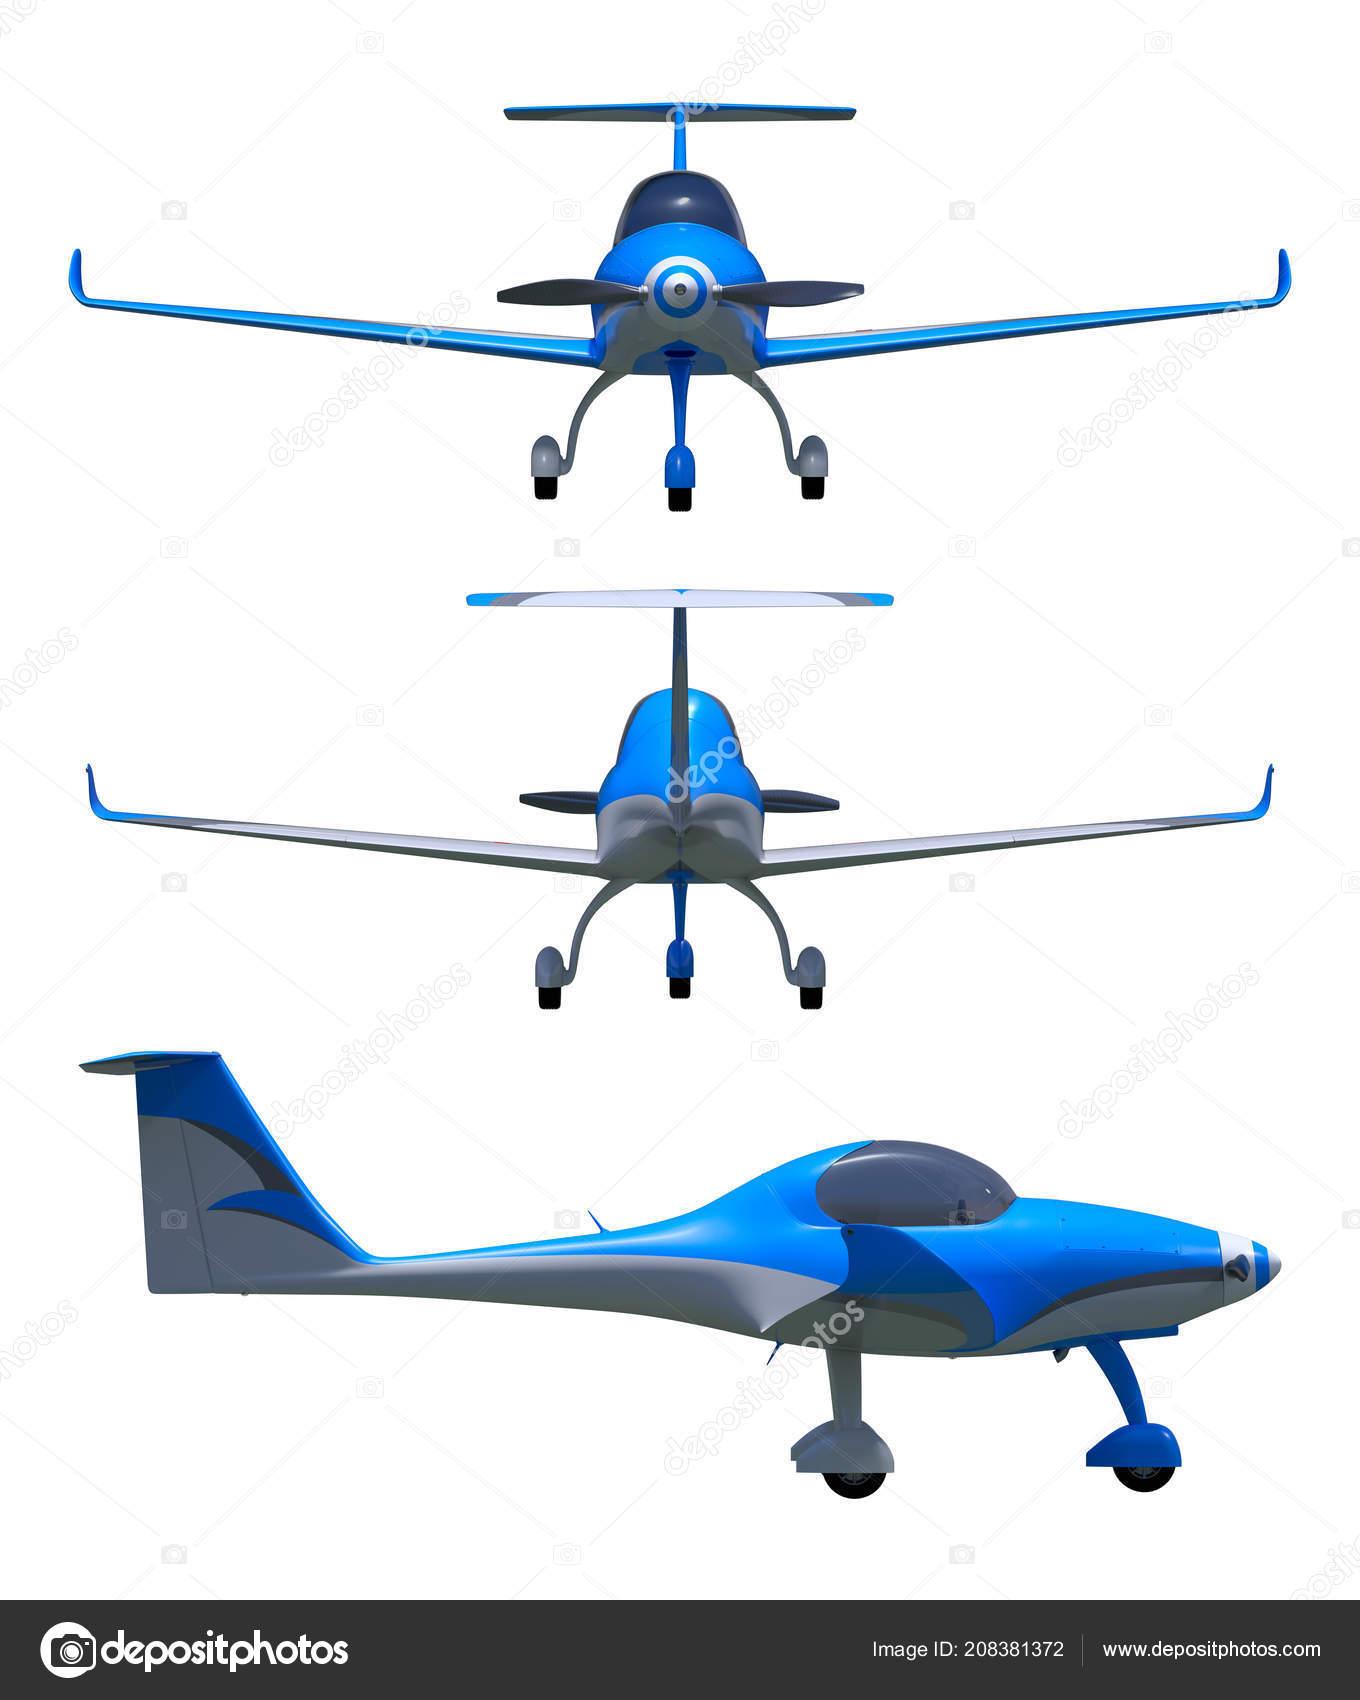 Render Light Sport Aircraft Small General Aviation Plane